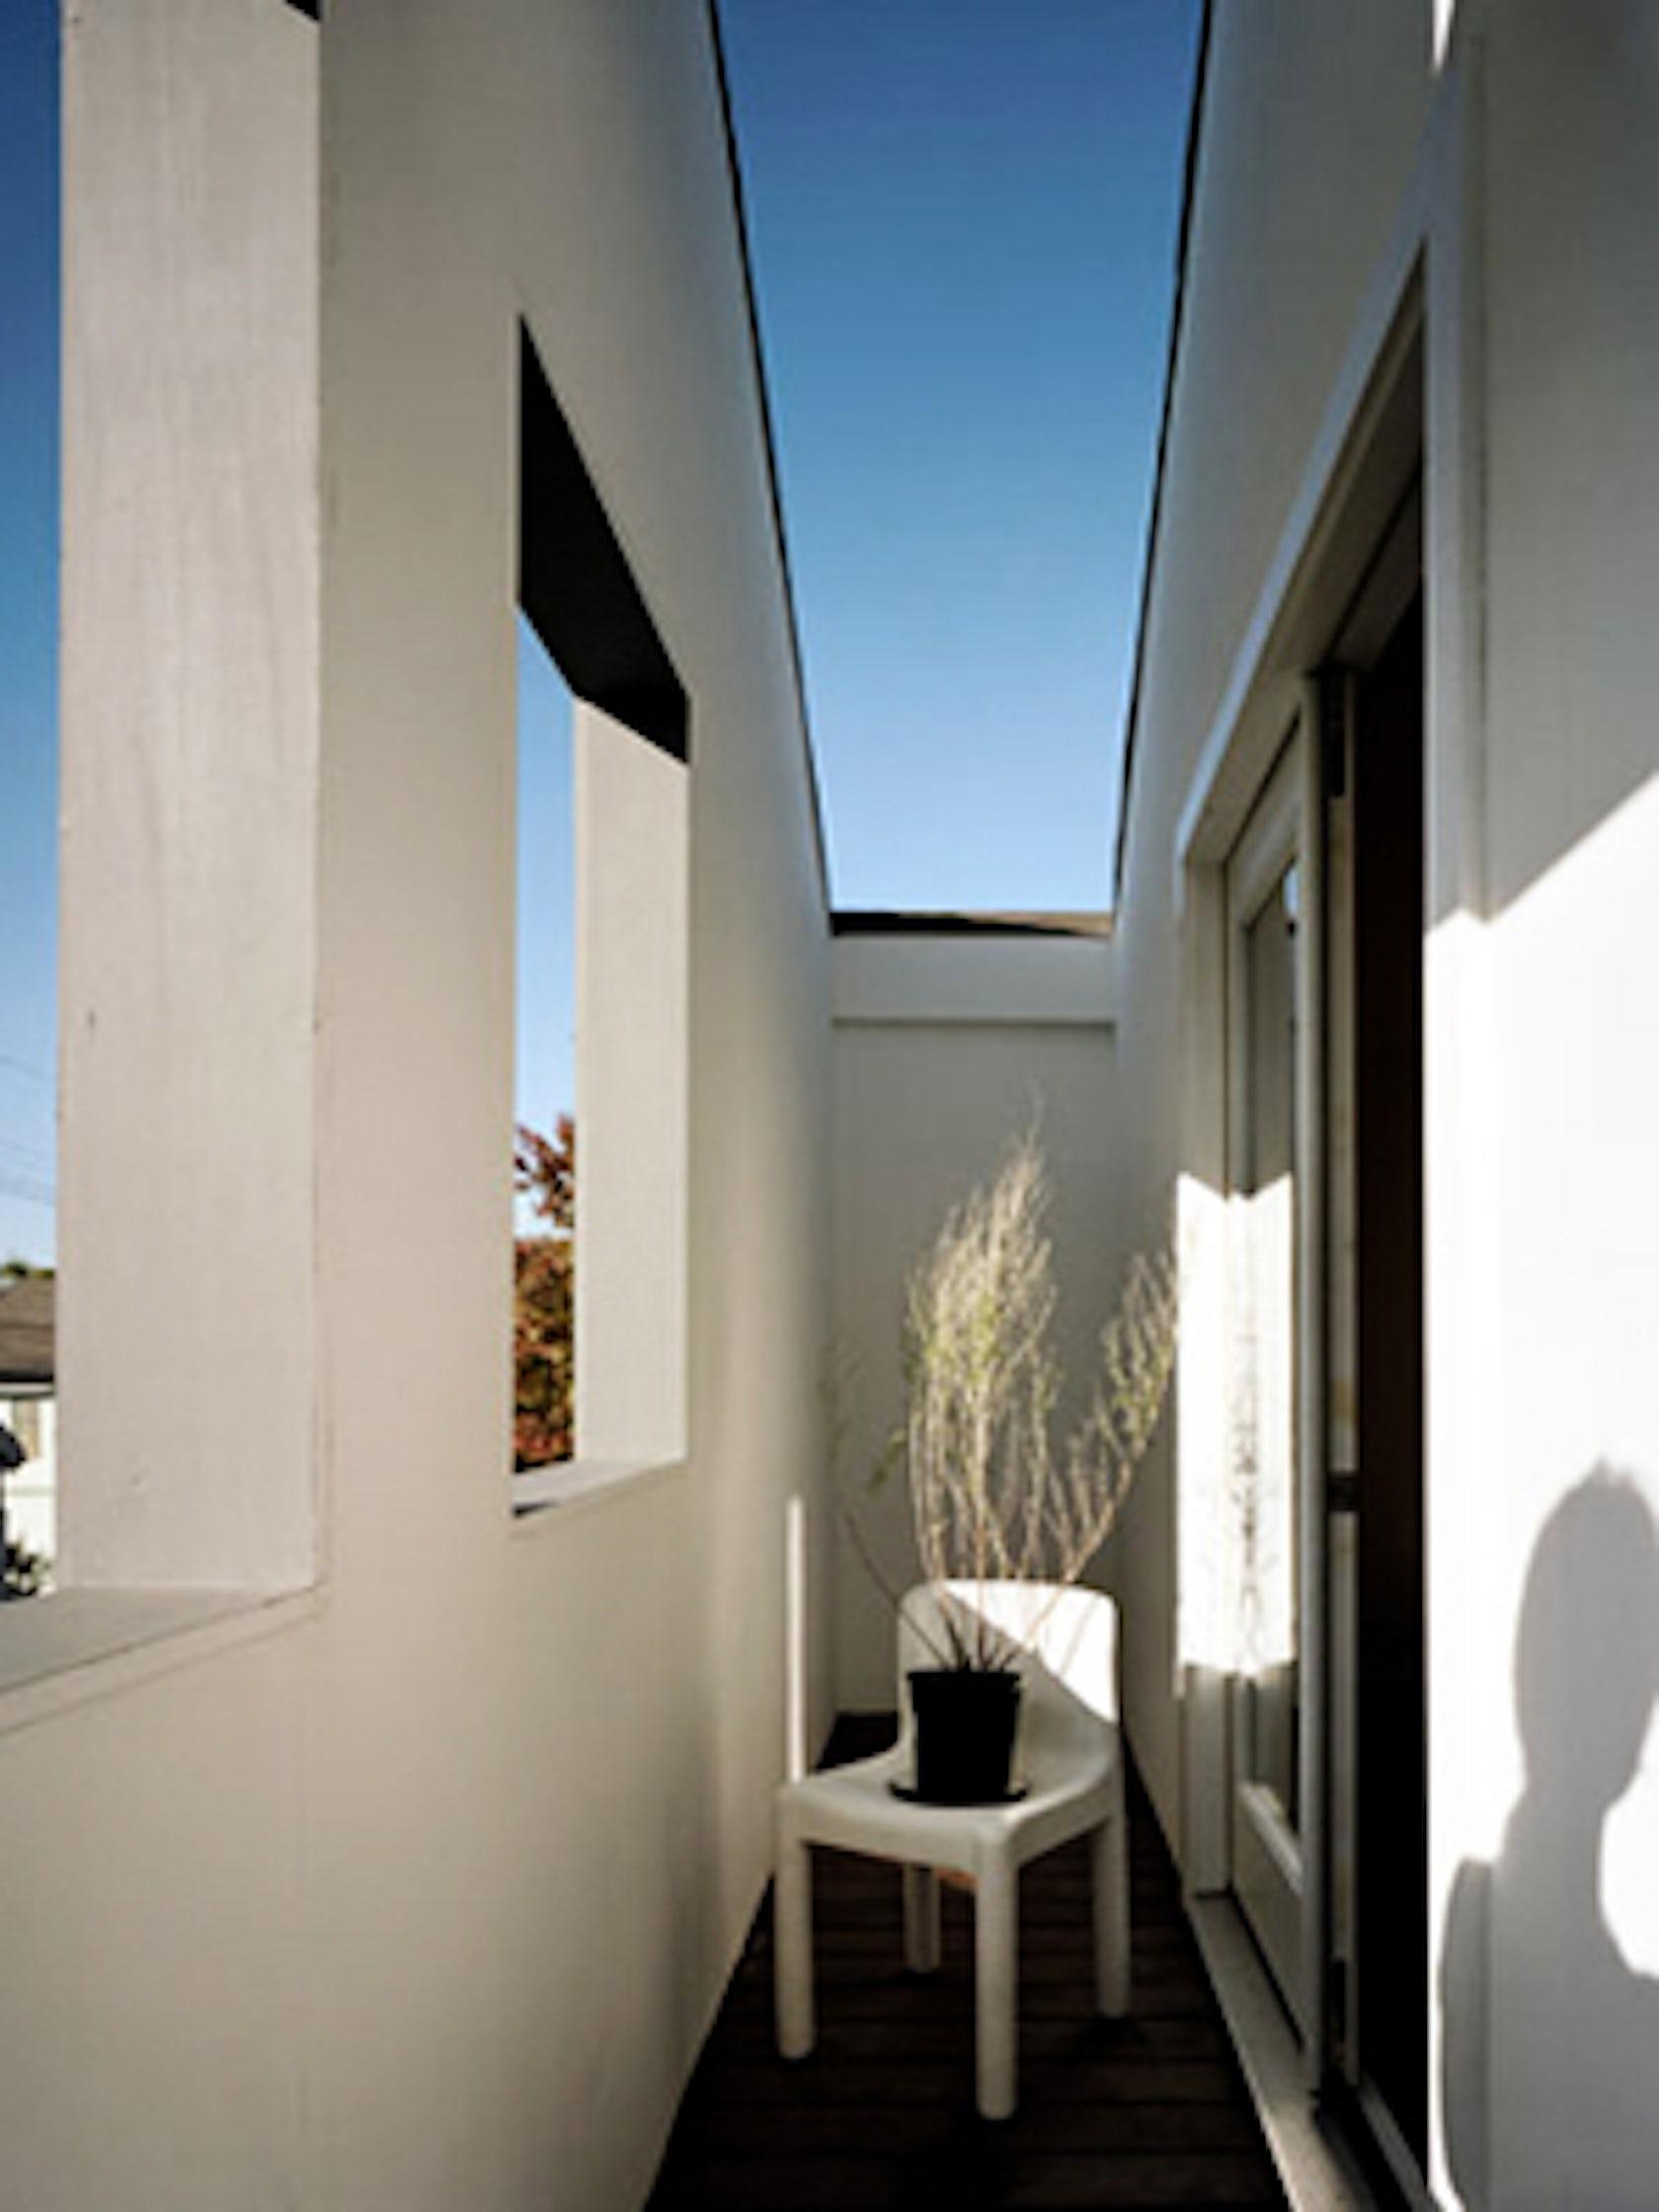 UNI architecture on Architizer on